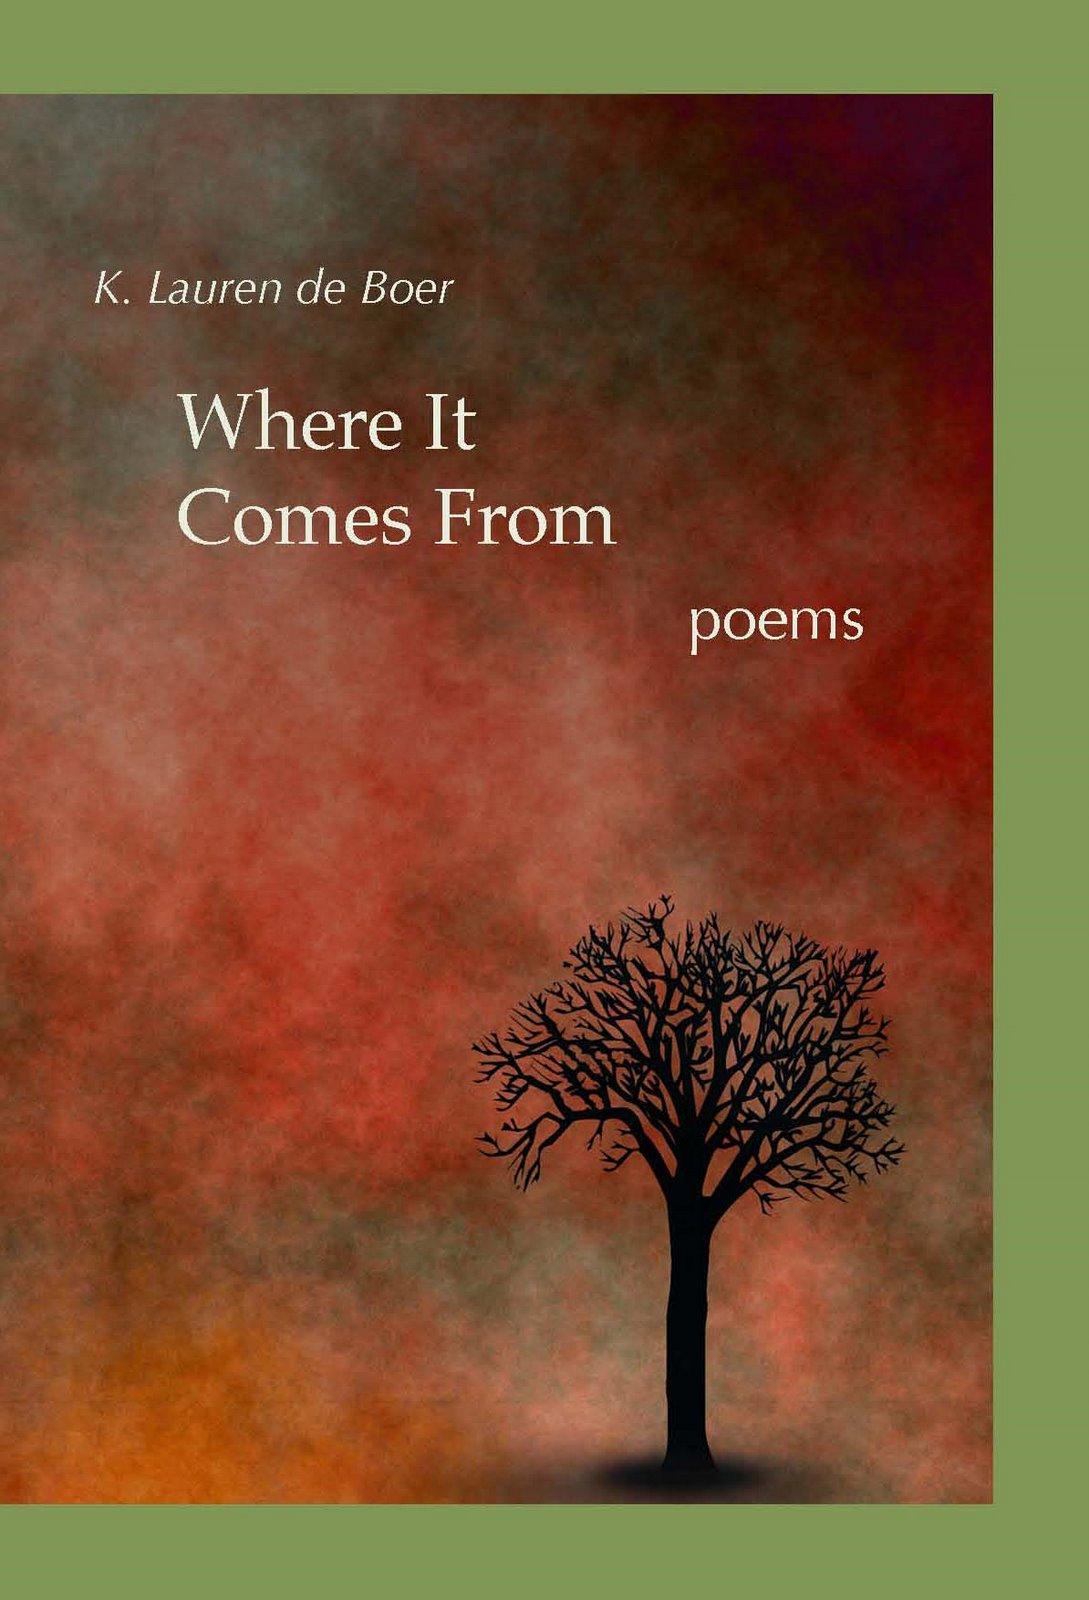 [Book_Poems_Cover.jpg]